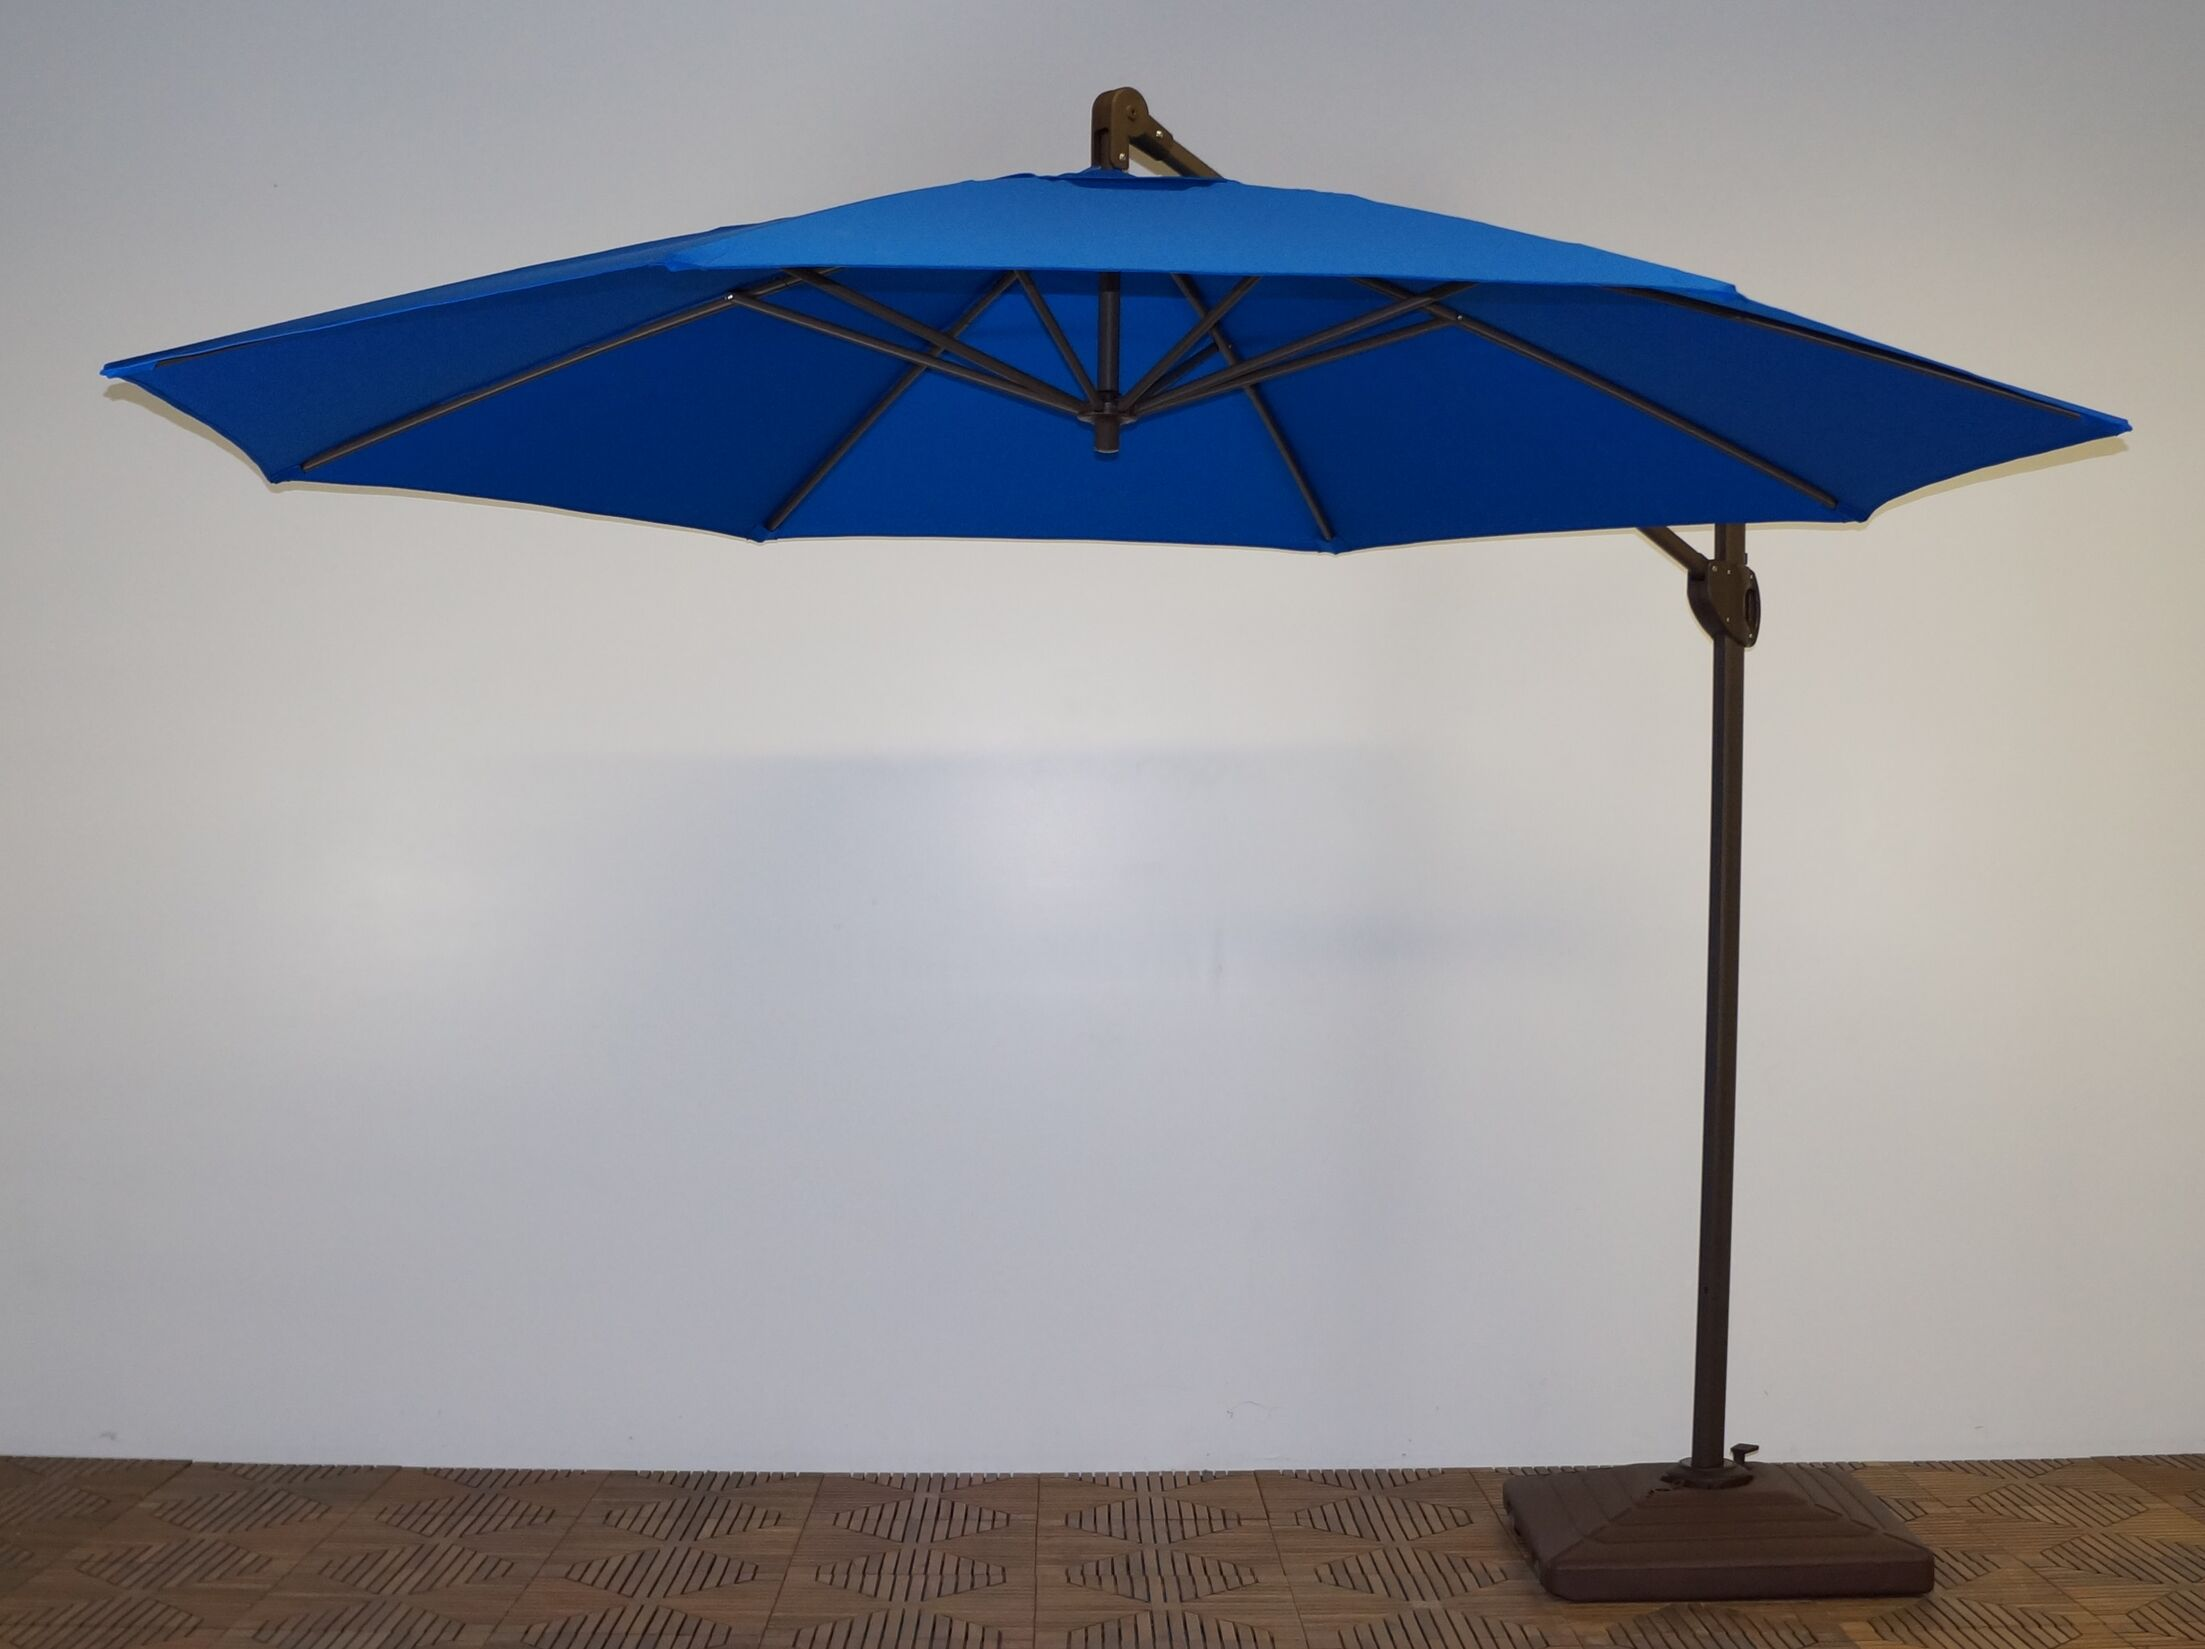 11' Cantilever Umbrella Fabric: Pacific Blue